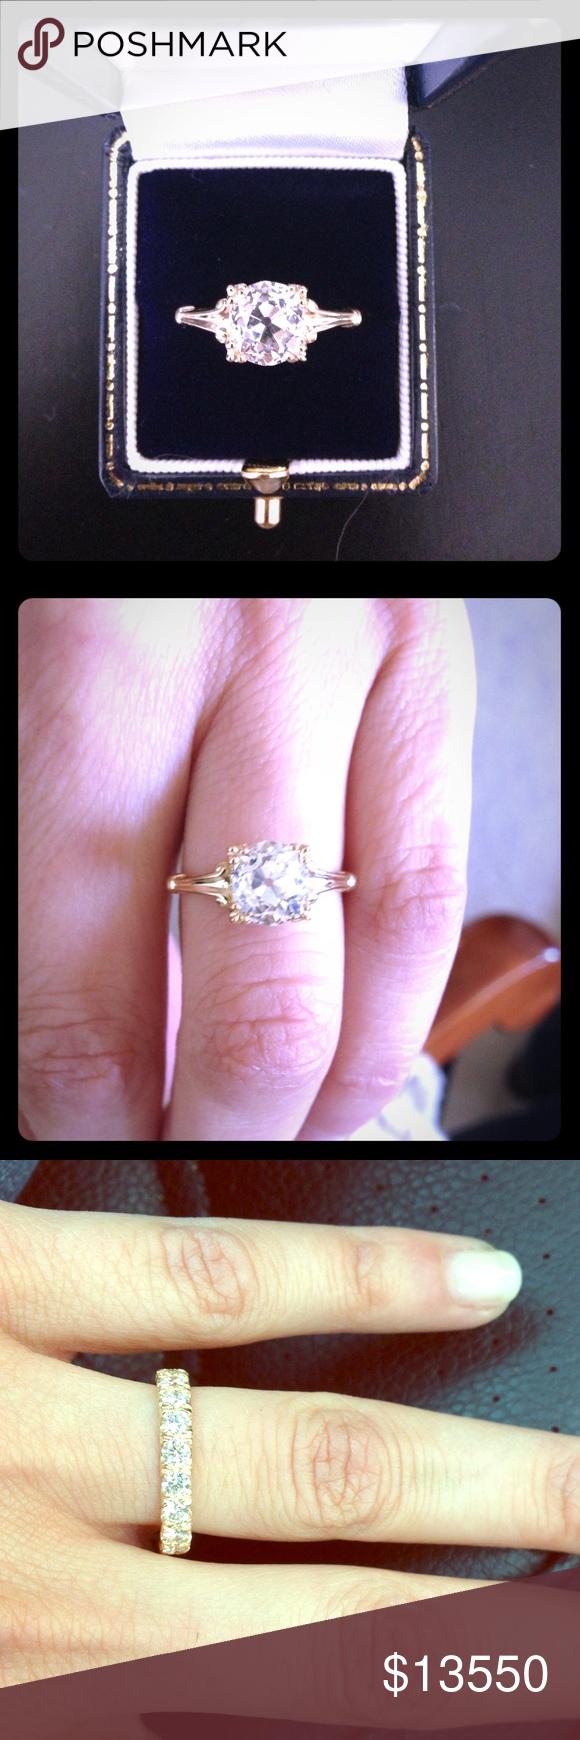 Engagement Ring & Wedding Band (set) | My Posh Picks | Pinterest